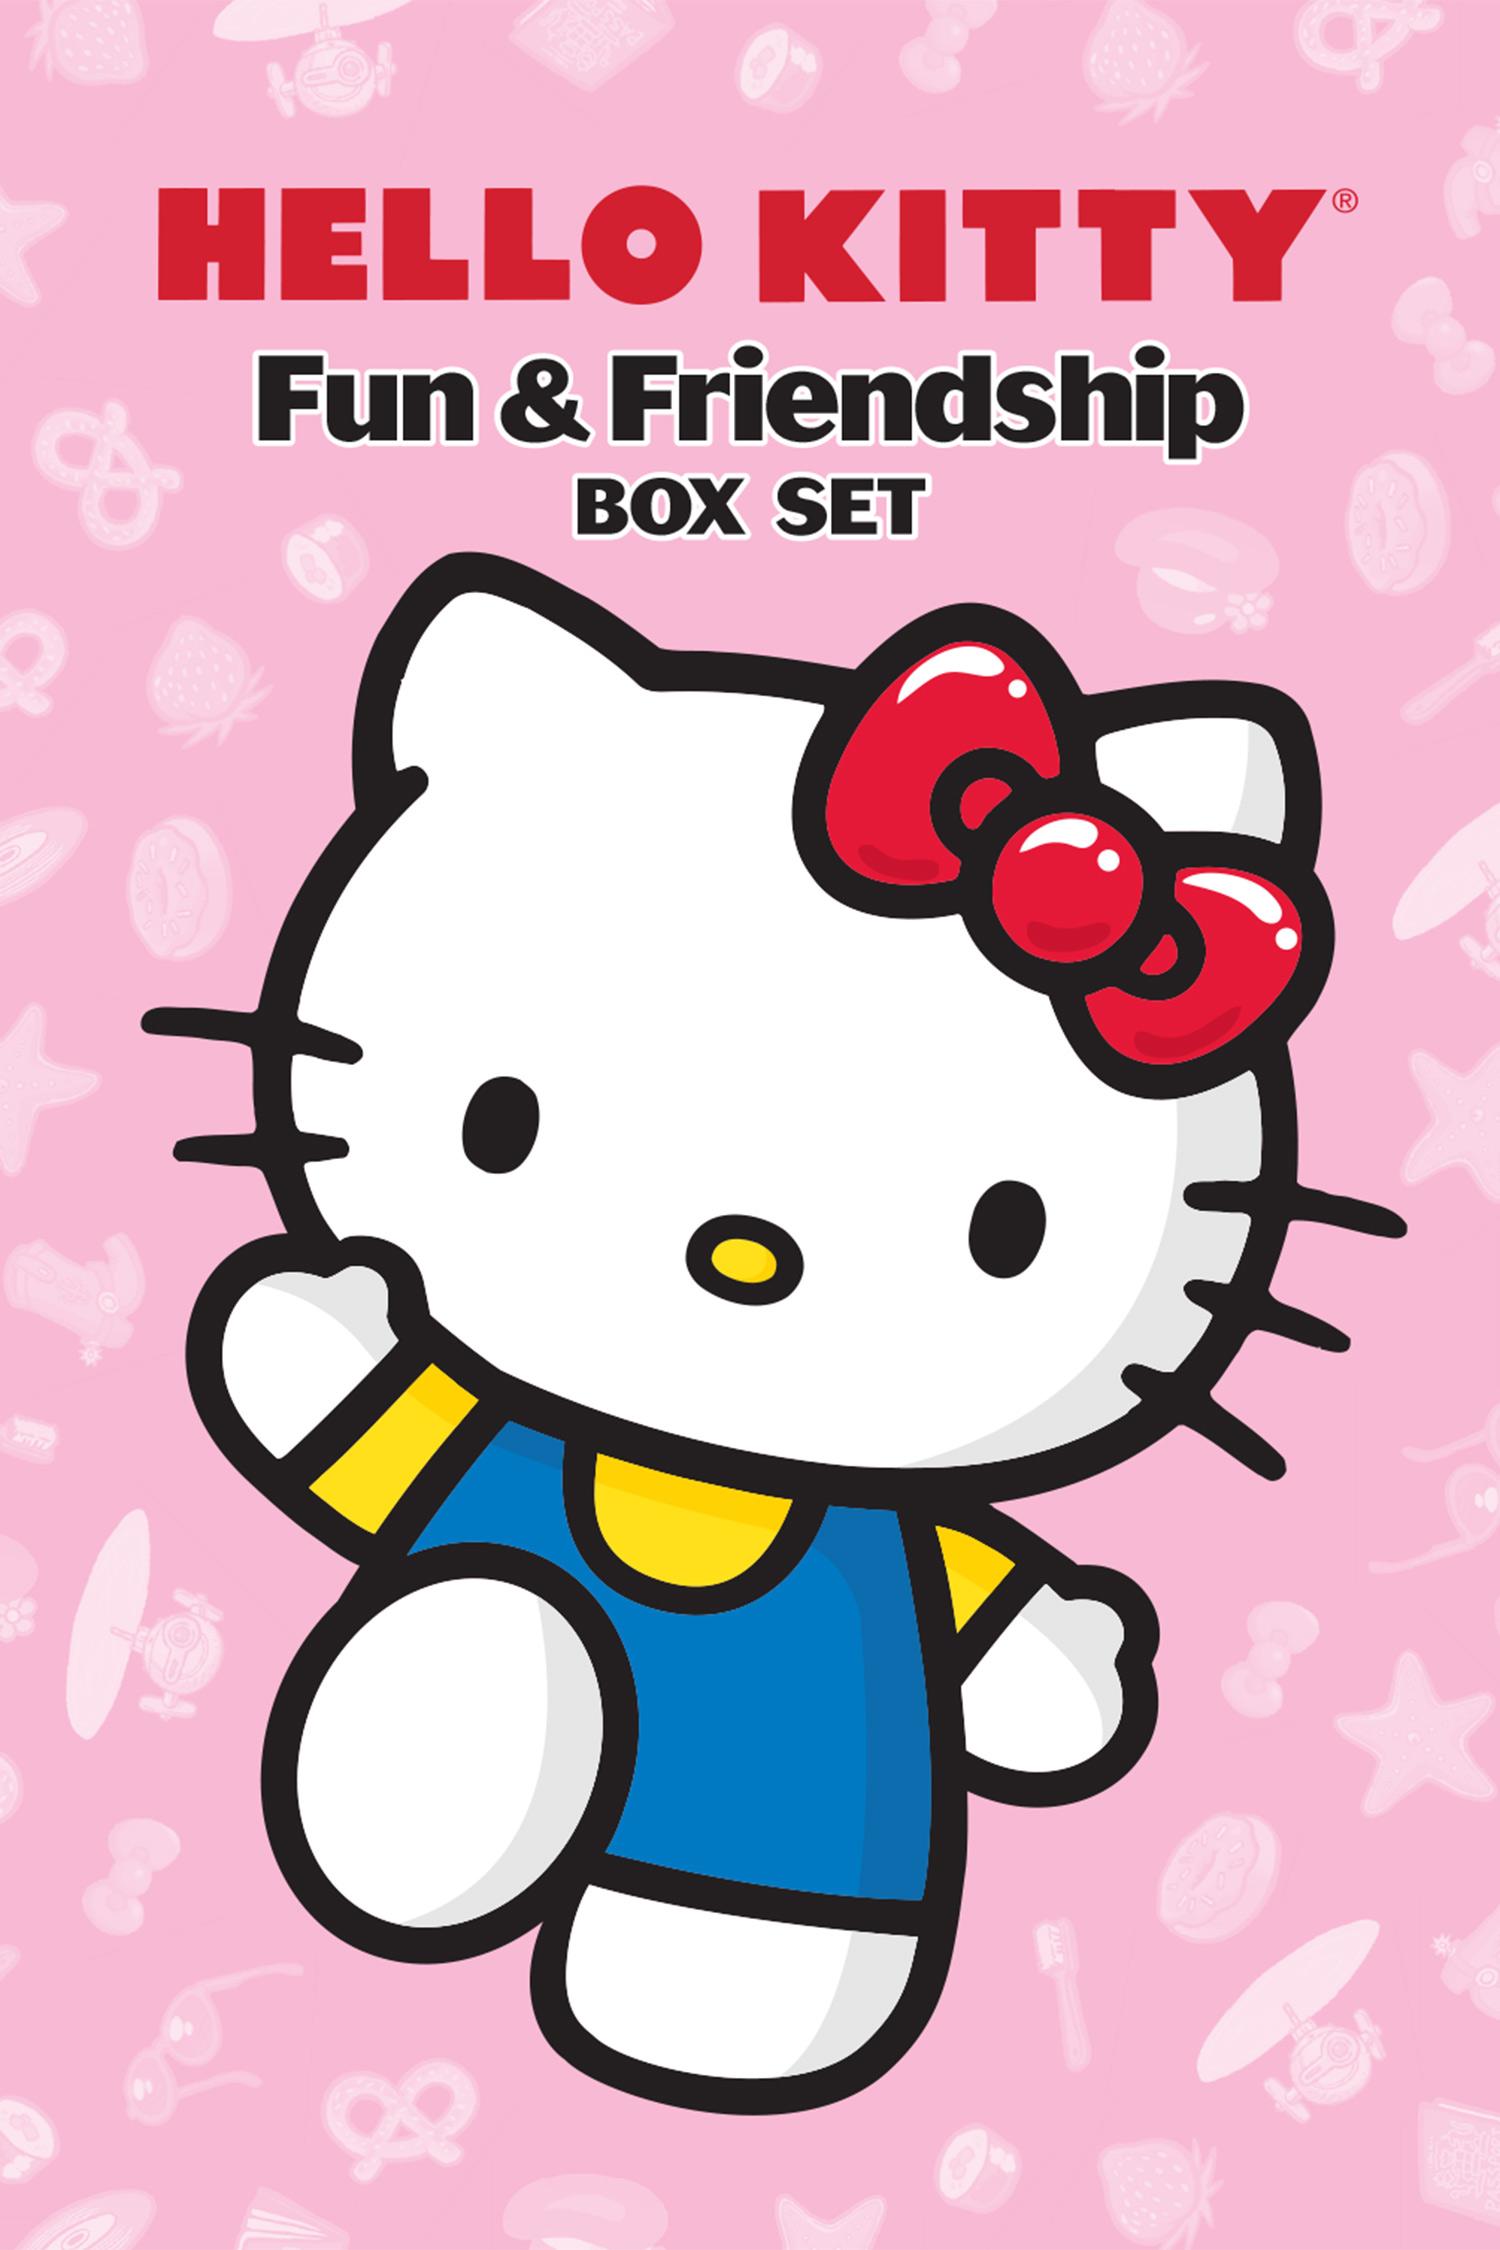 New Hello Kitty GN Box Set Announced  Otaku Dome  The Latest